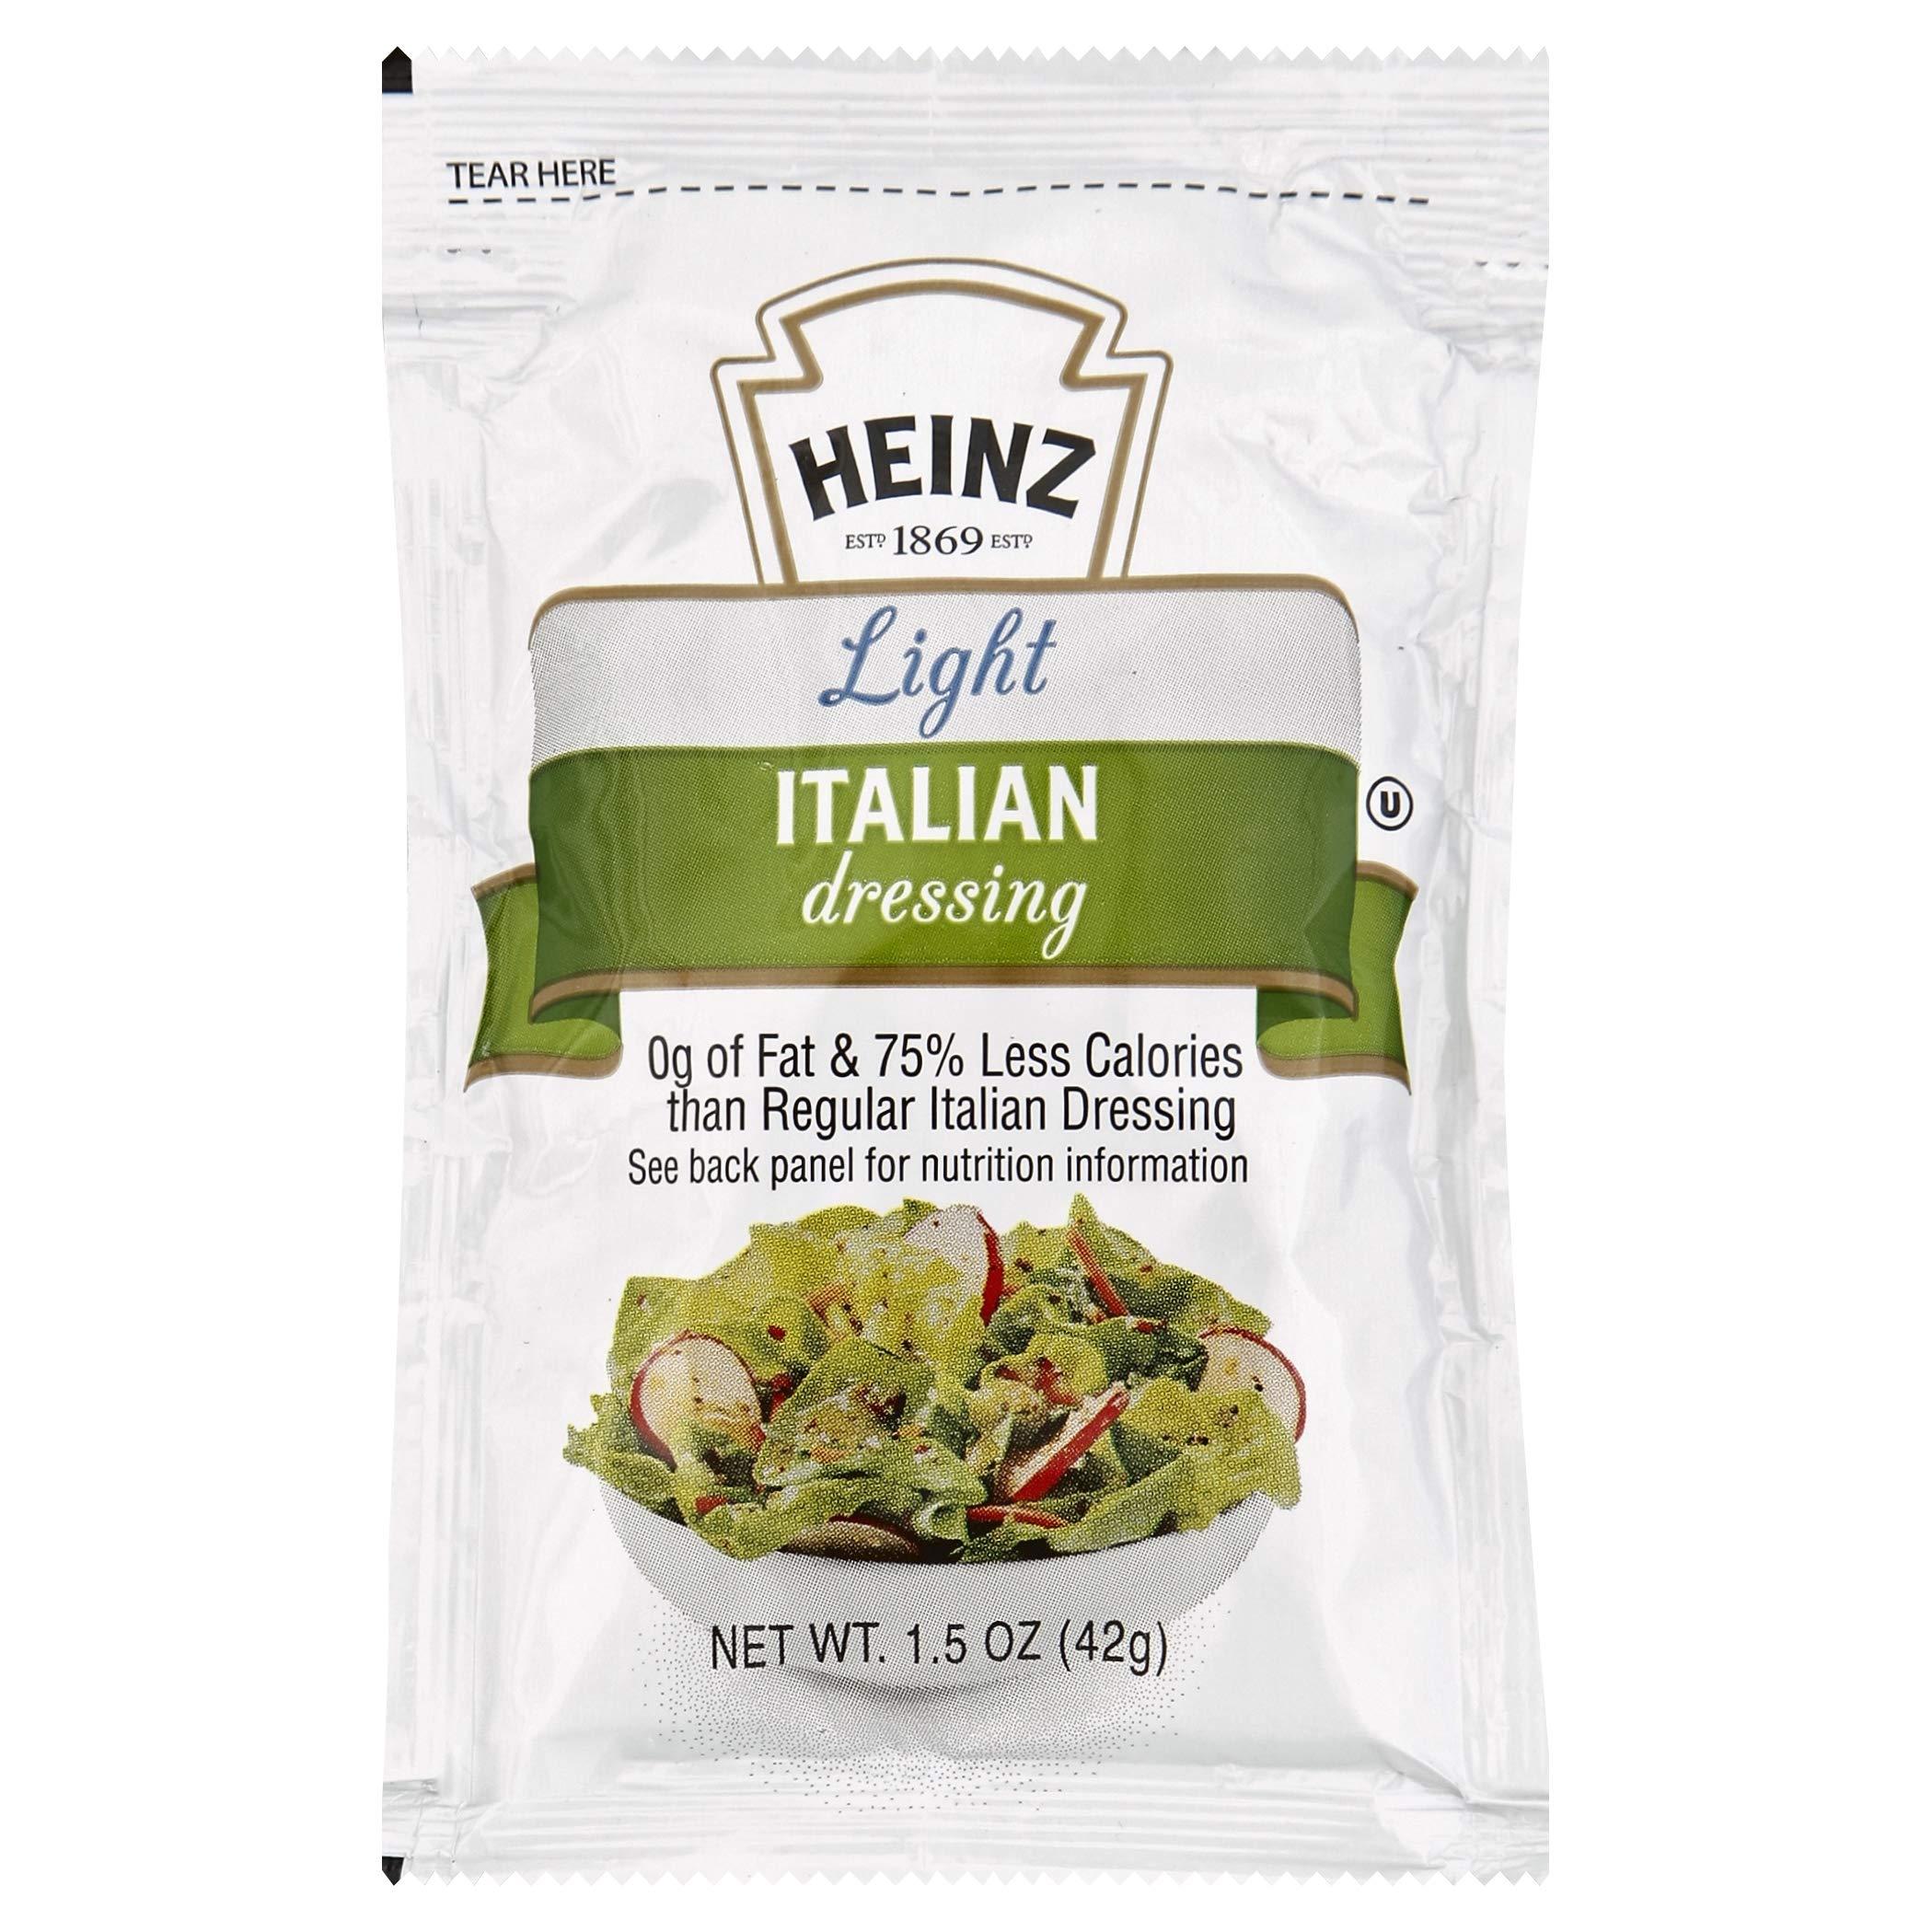 Heinz Light Italian Dressing Single Serve (1.5oz Packets, Pack of 60)